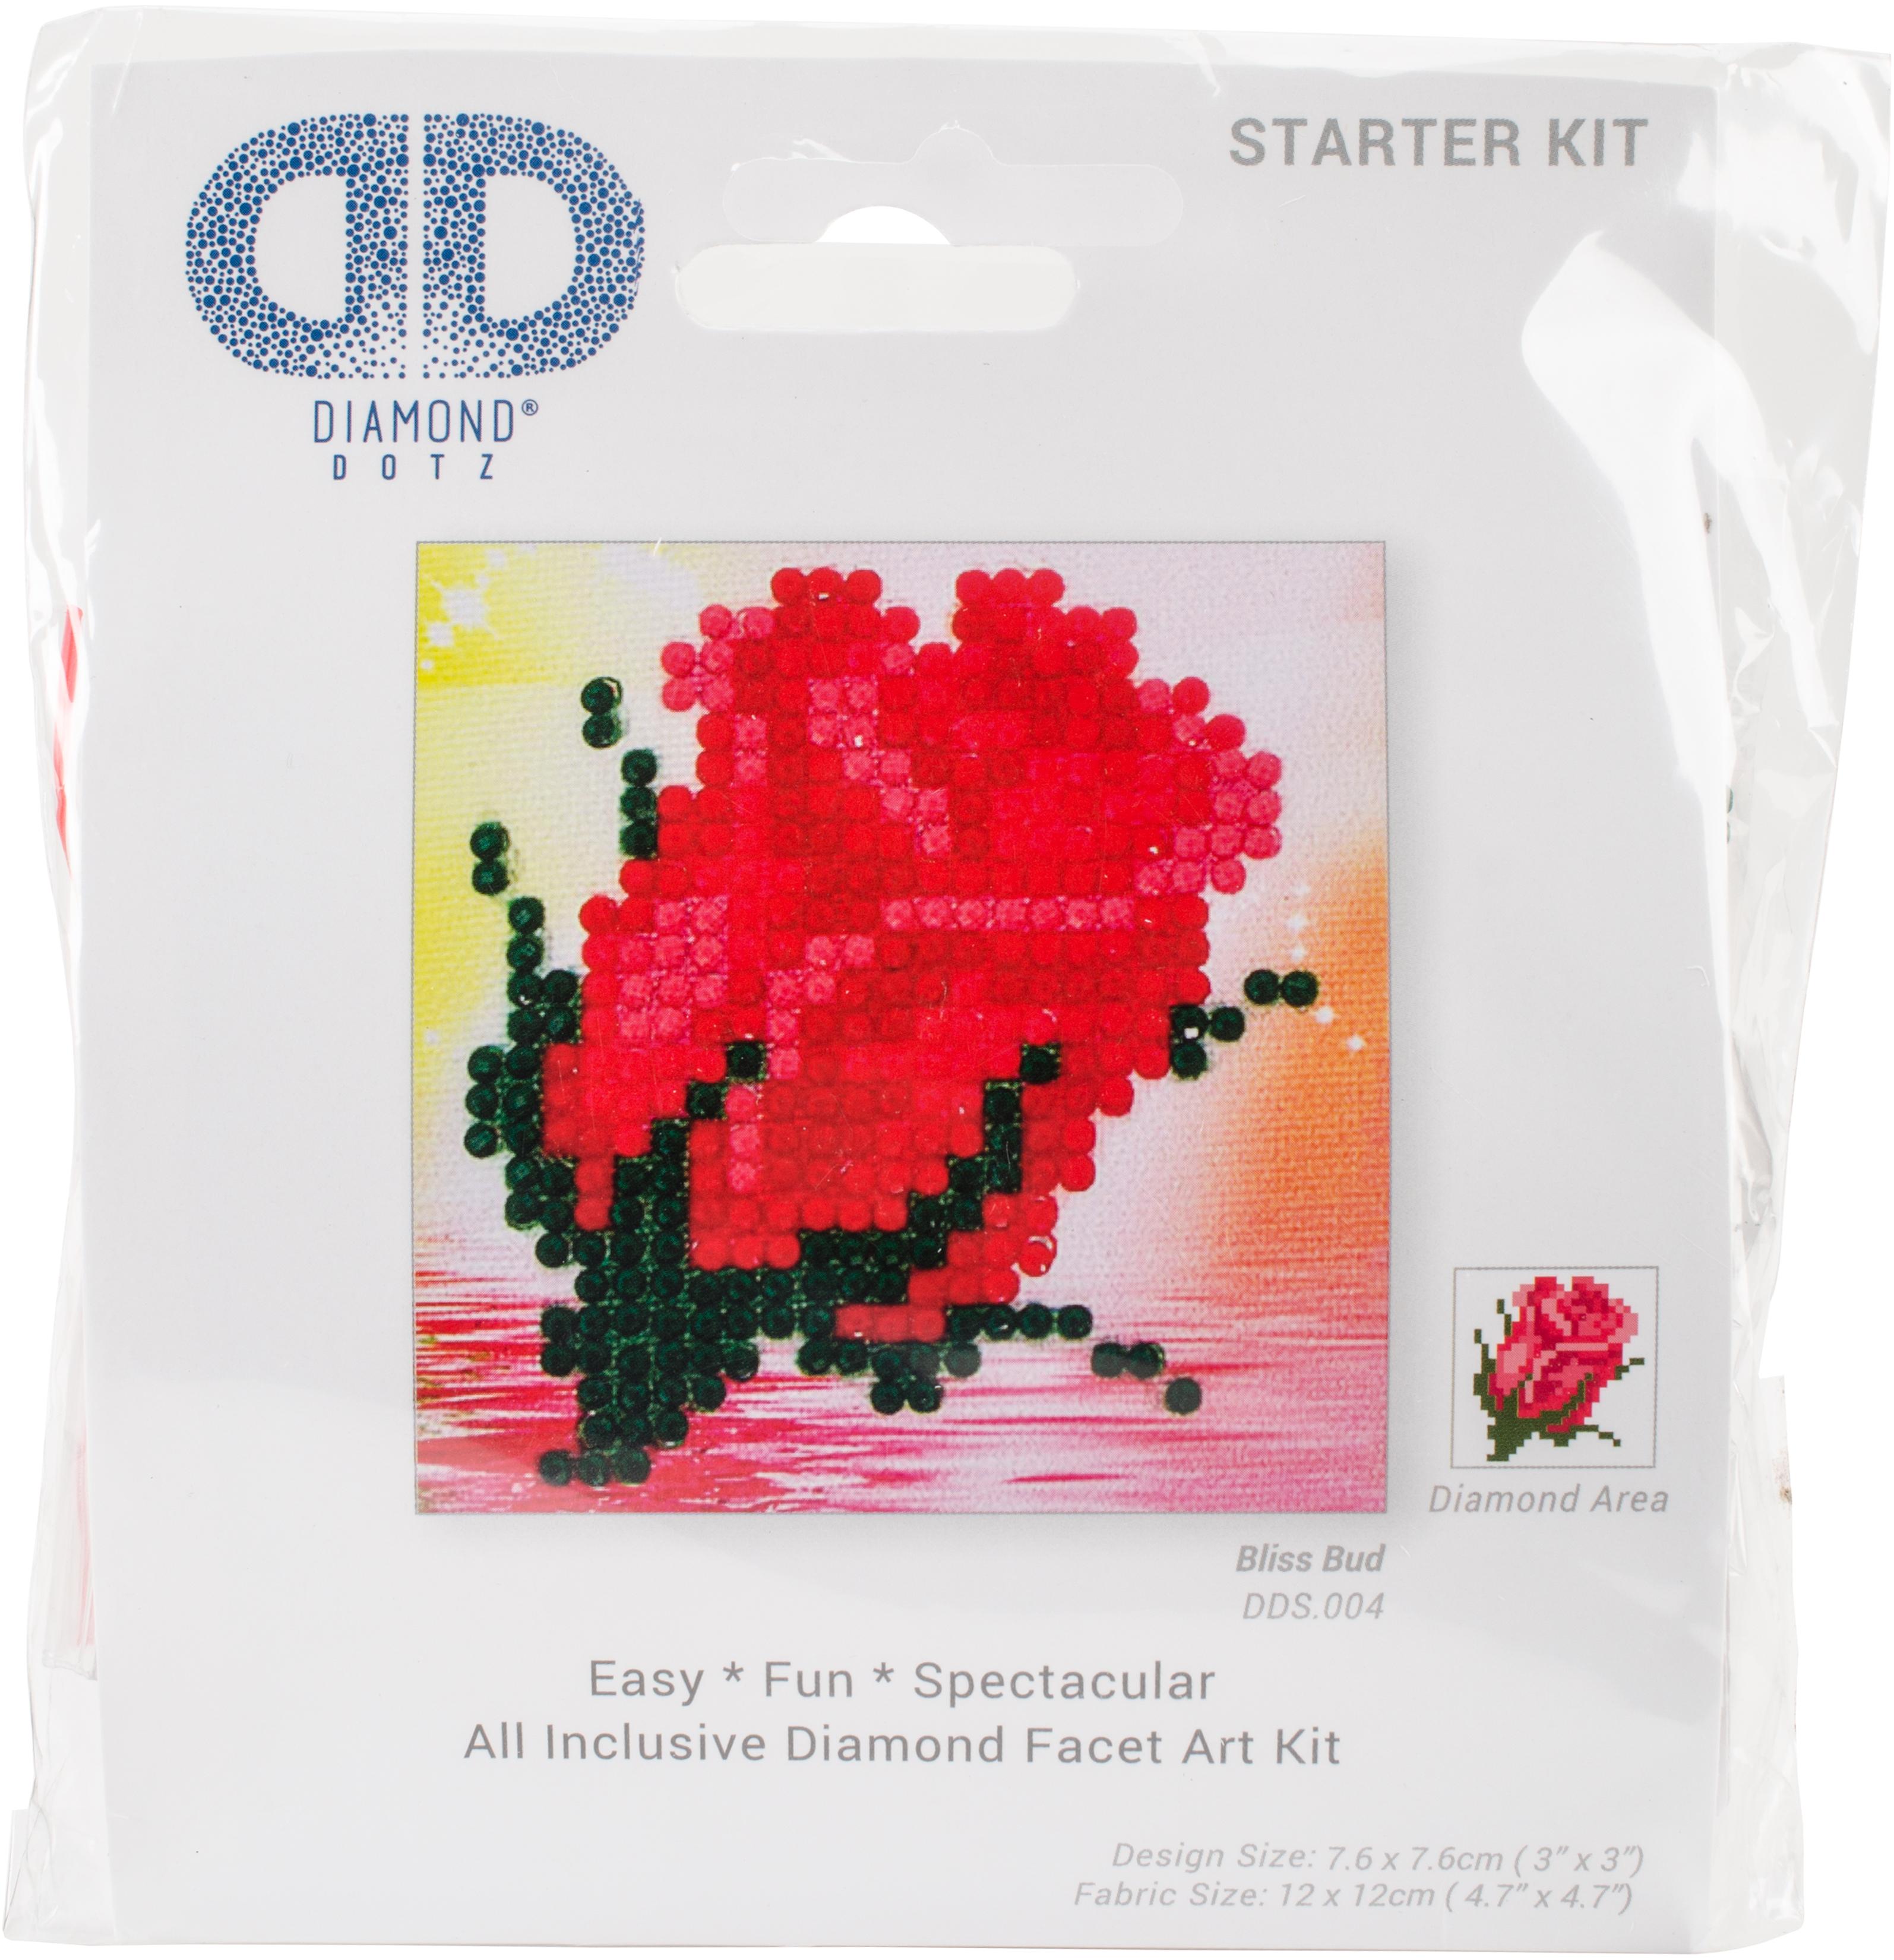 Diamond Dotz Diamond Embroidery Facet Art Kit 4.75X4.75-Bliss Bud